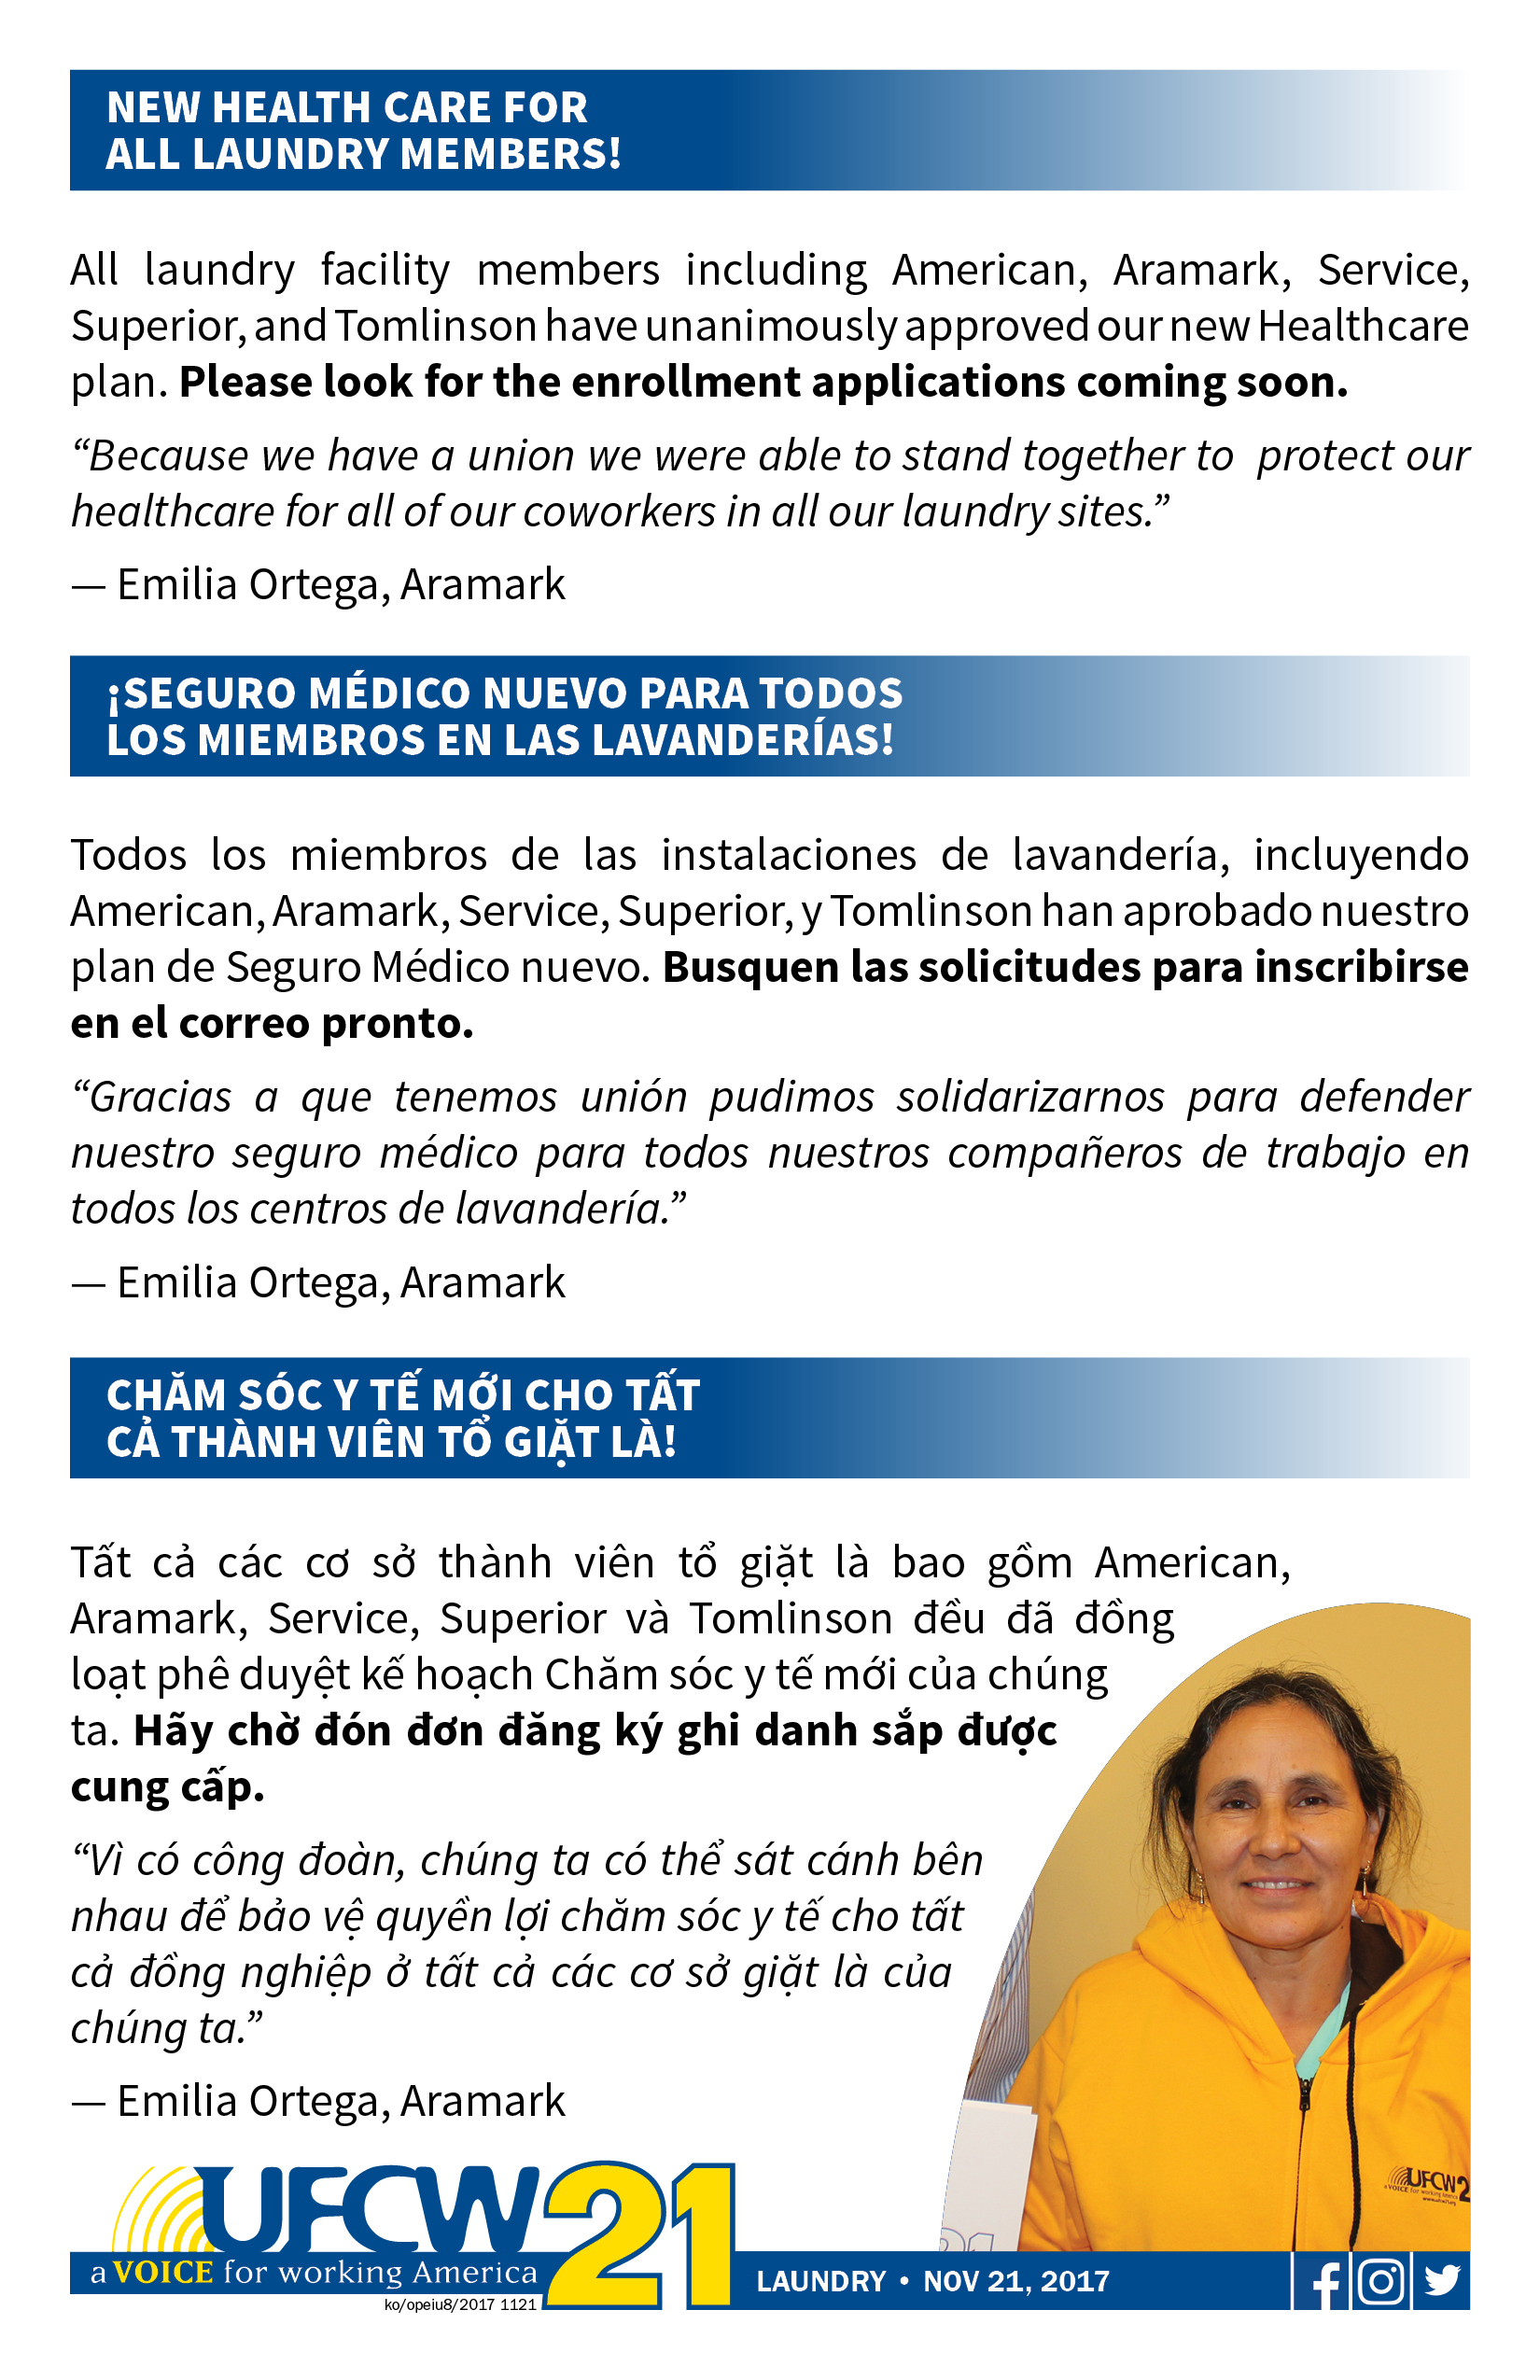 2017 1121 - American Linen, Aramark, Service Linen, Superior Linen, Tomlinson Linen.jpg